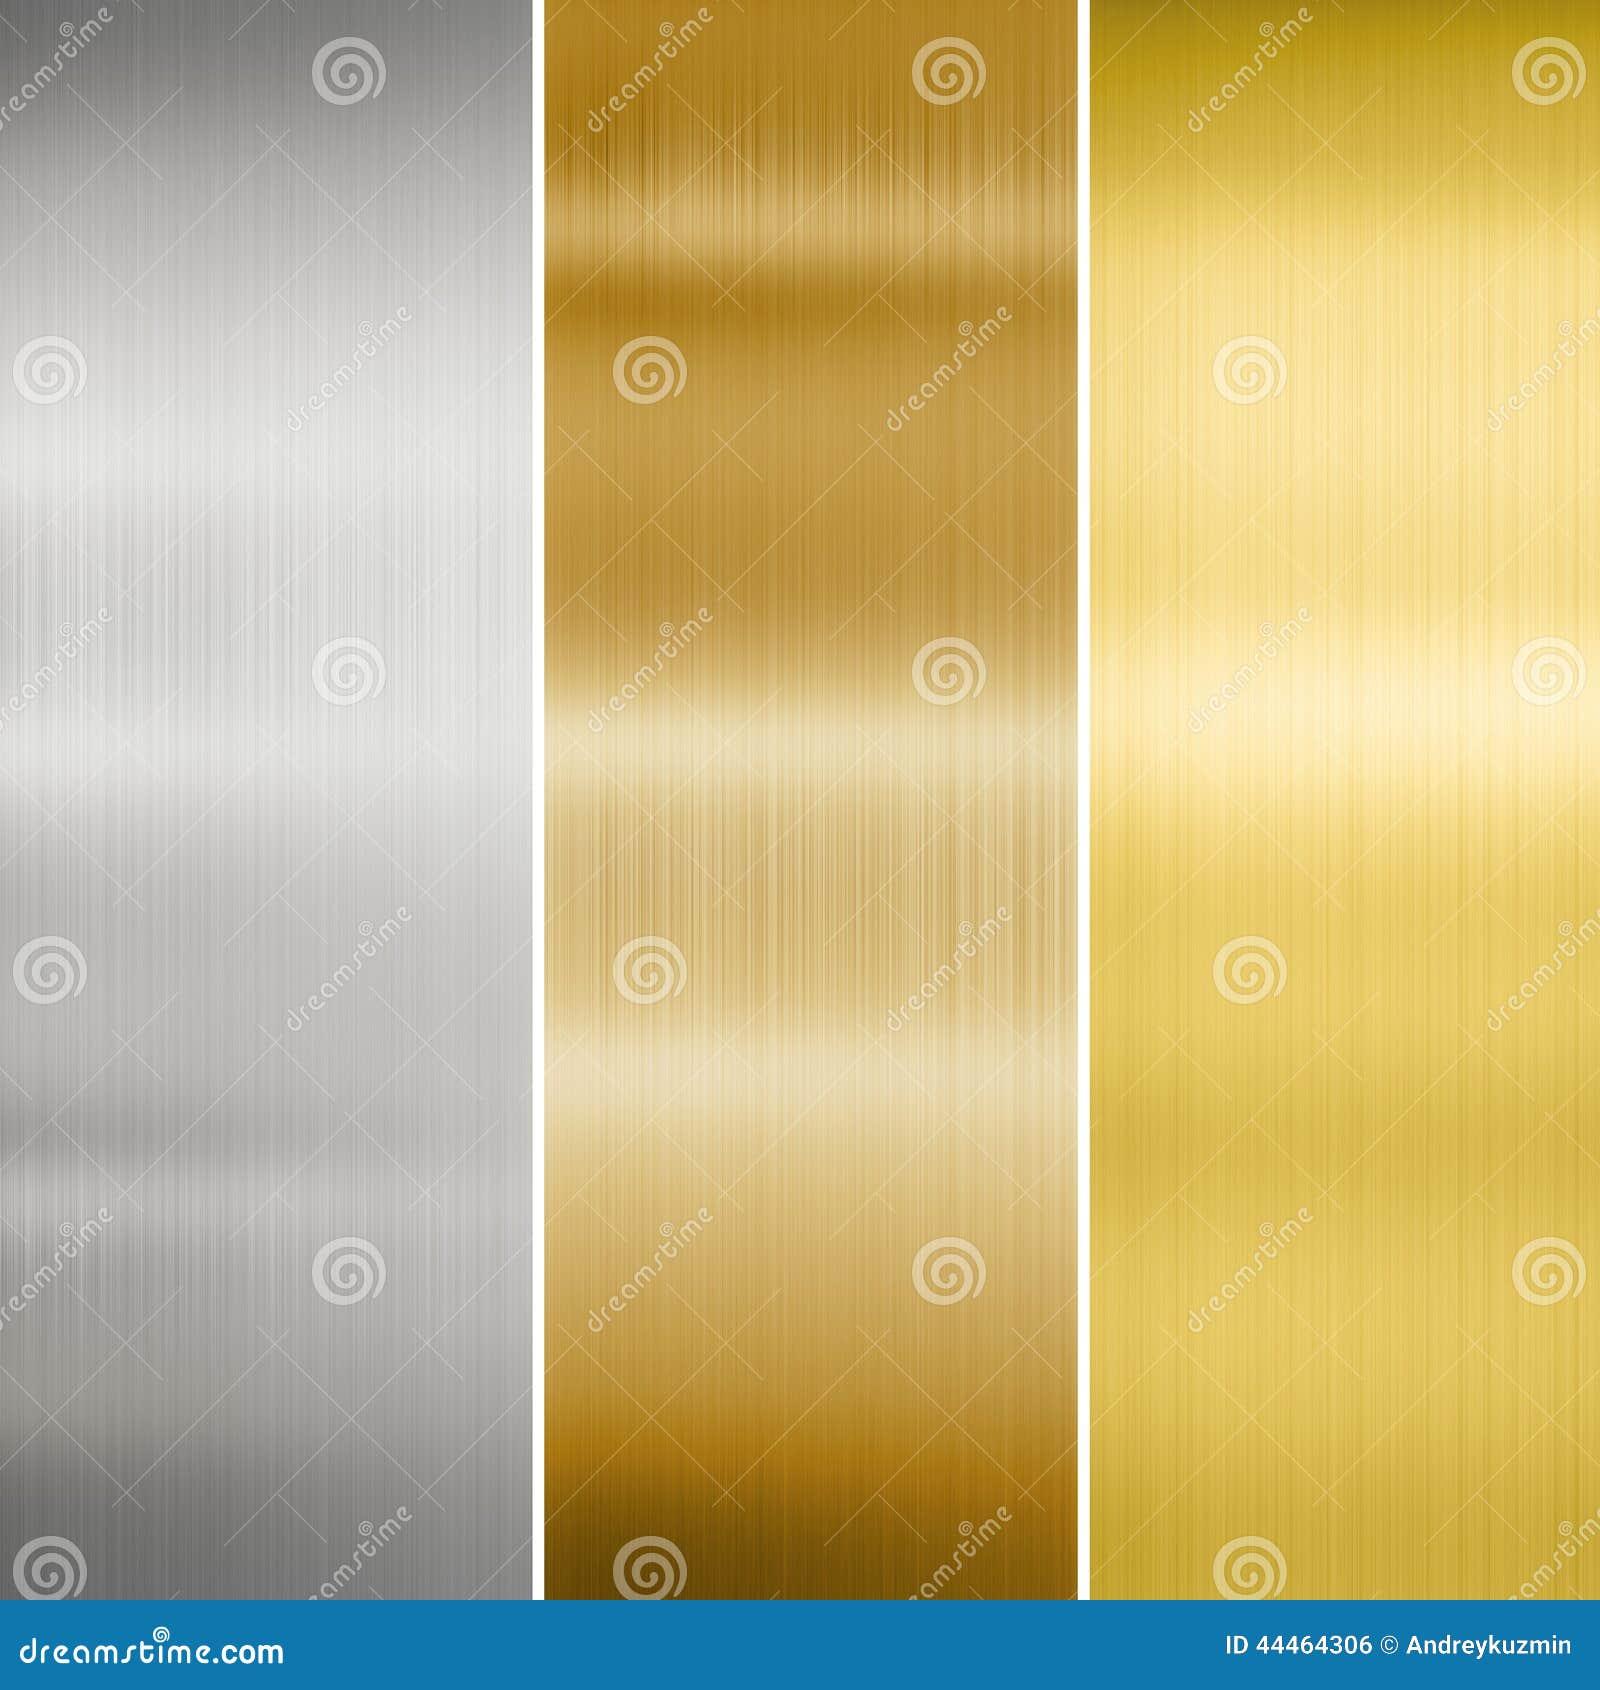 Metal tekstury złoto, srebro i brąz,